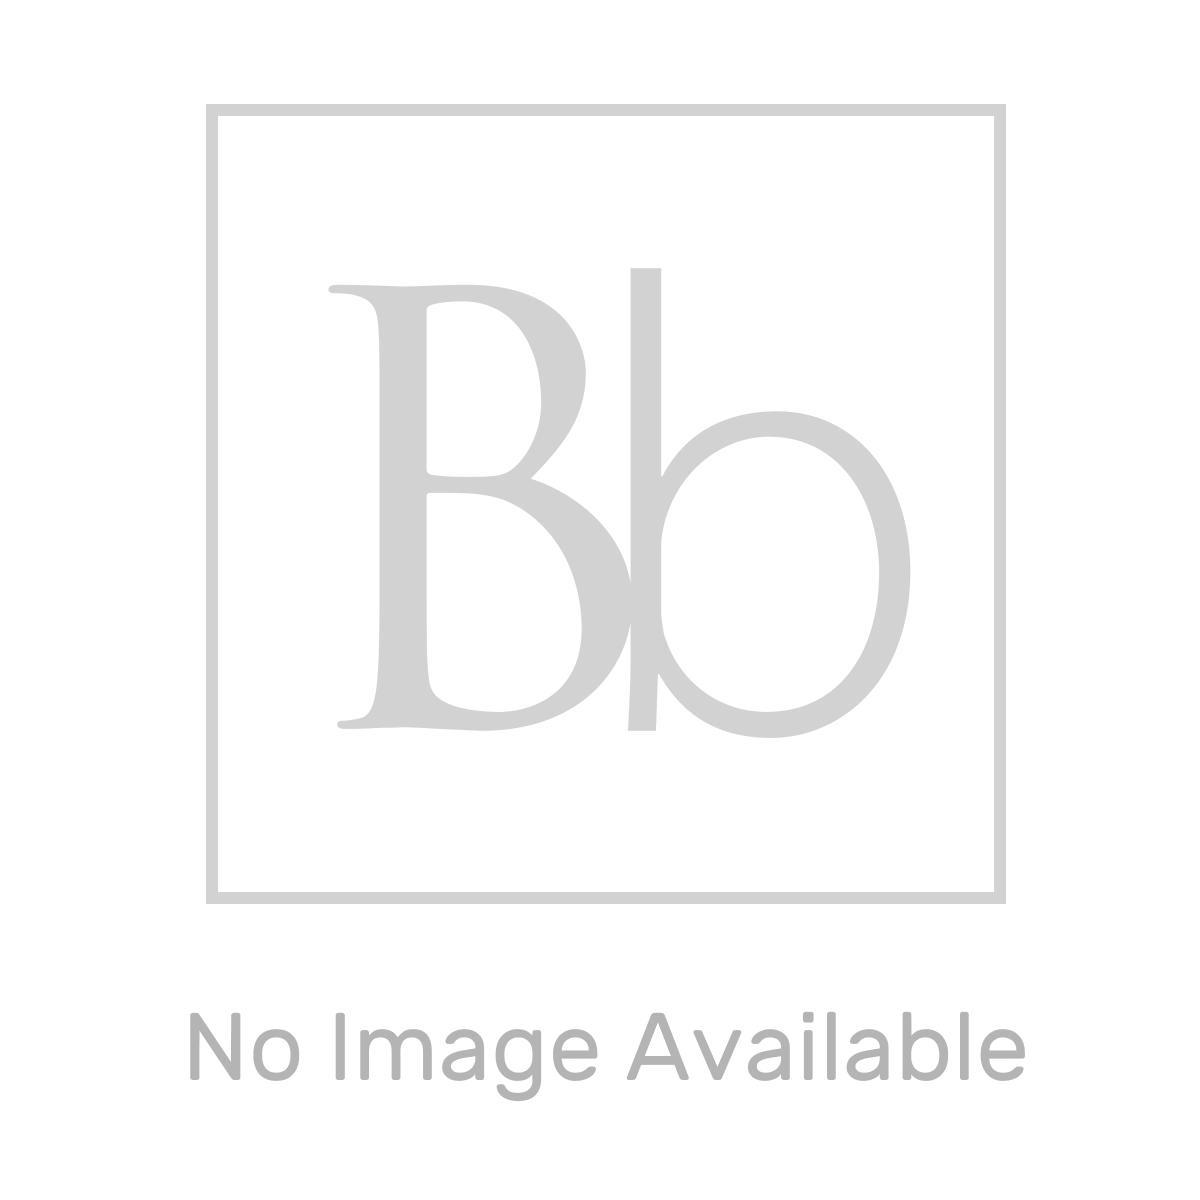 Zenith Form Mono Basin Mixer Tap